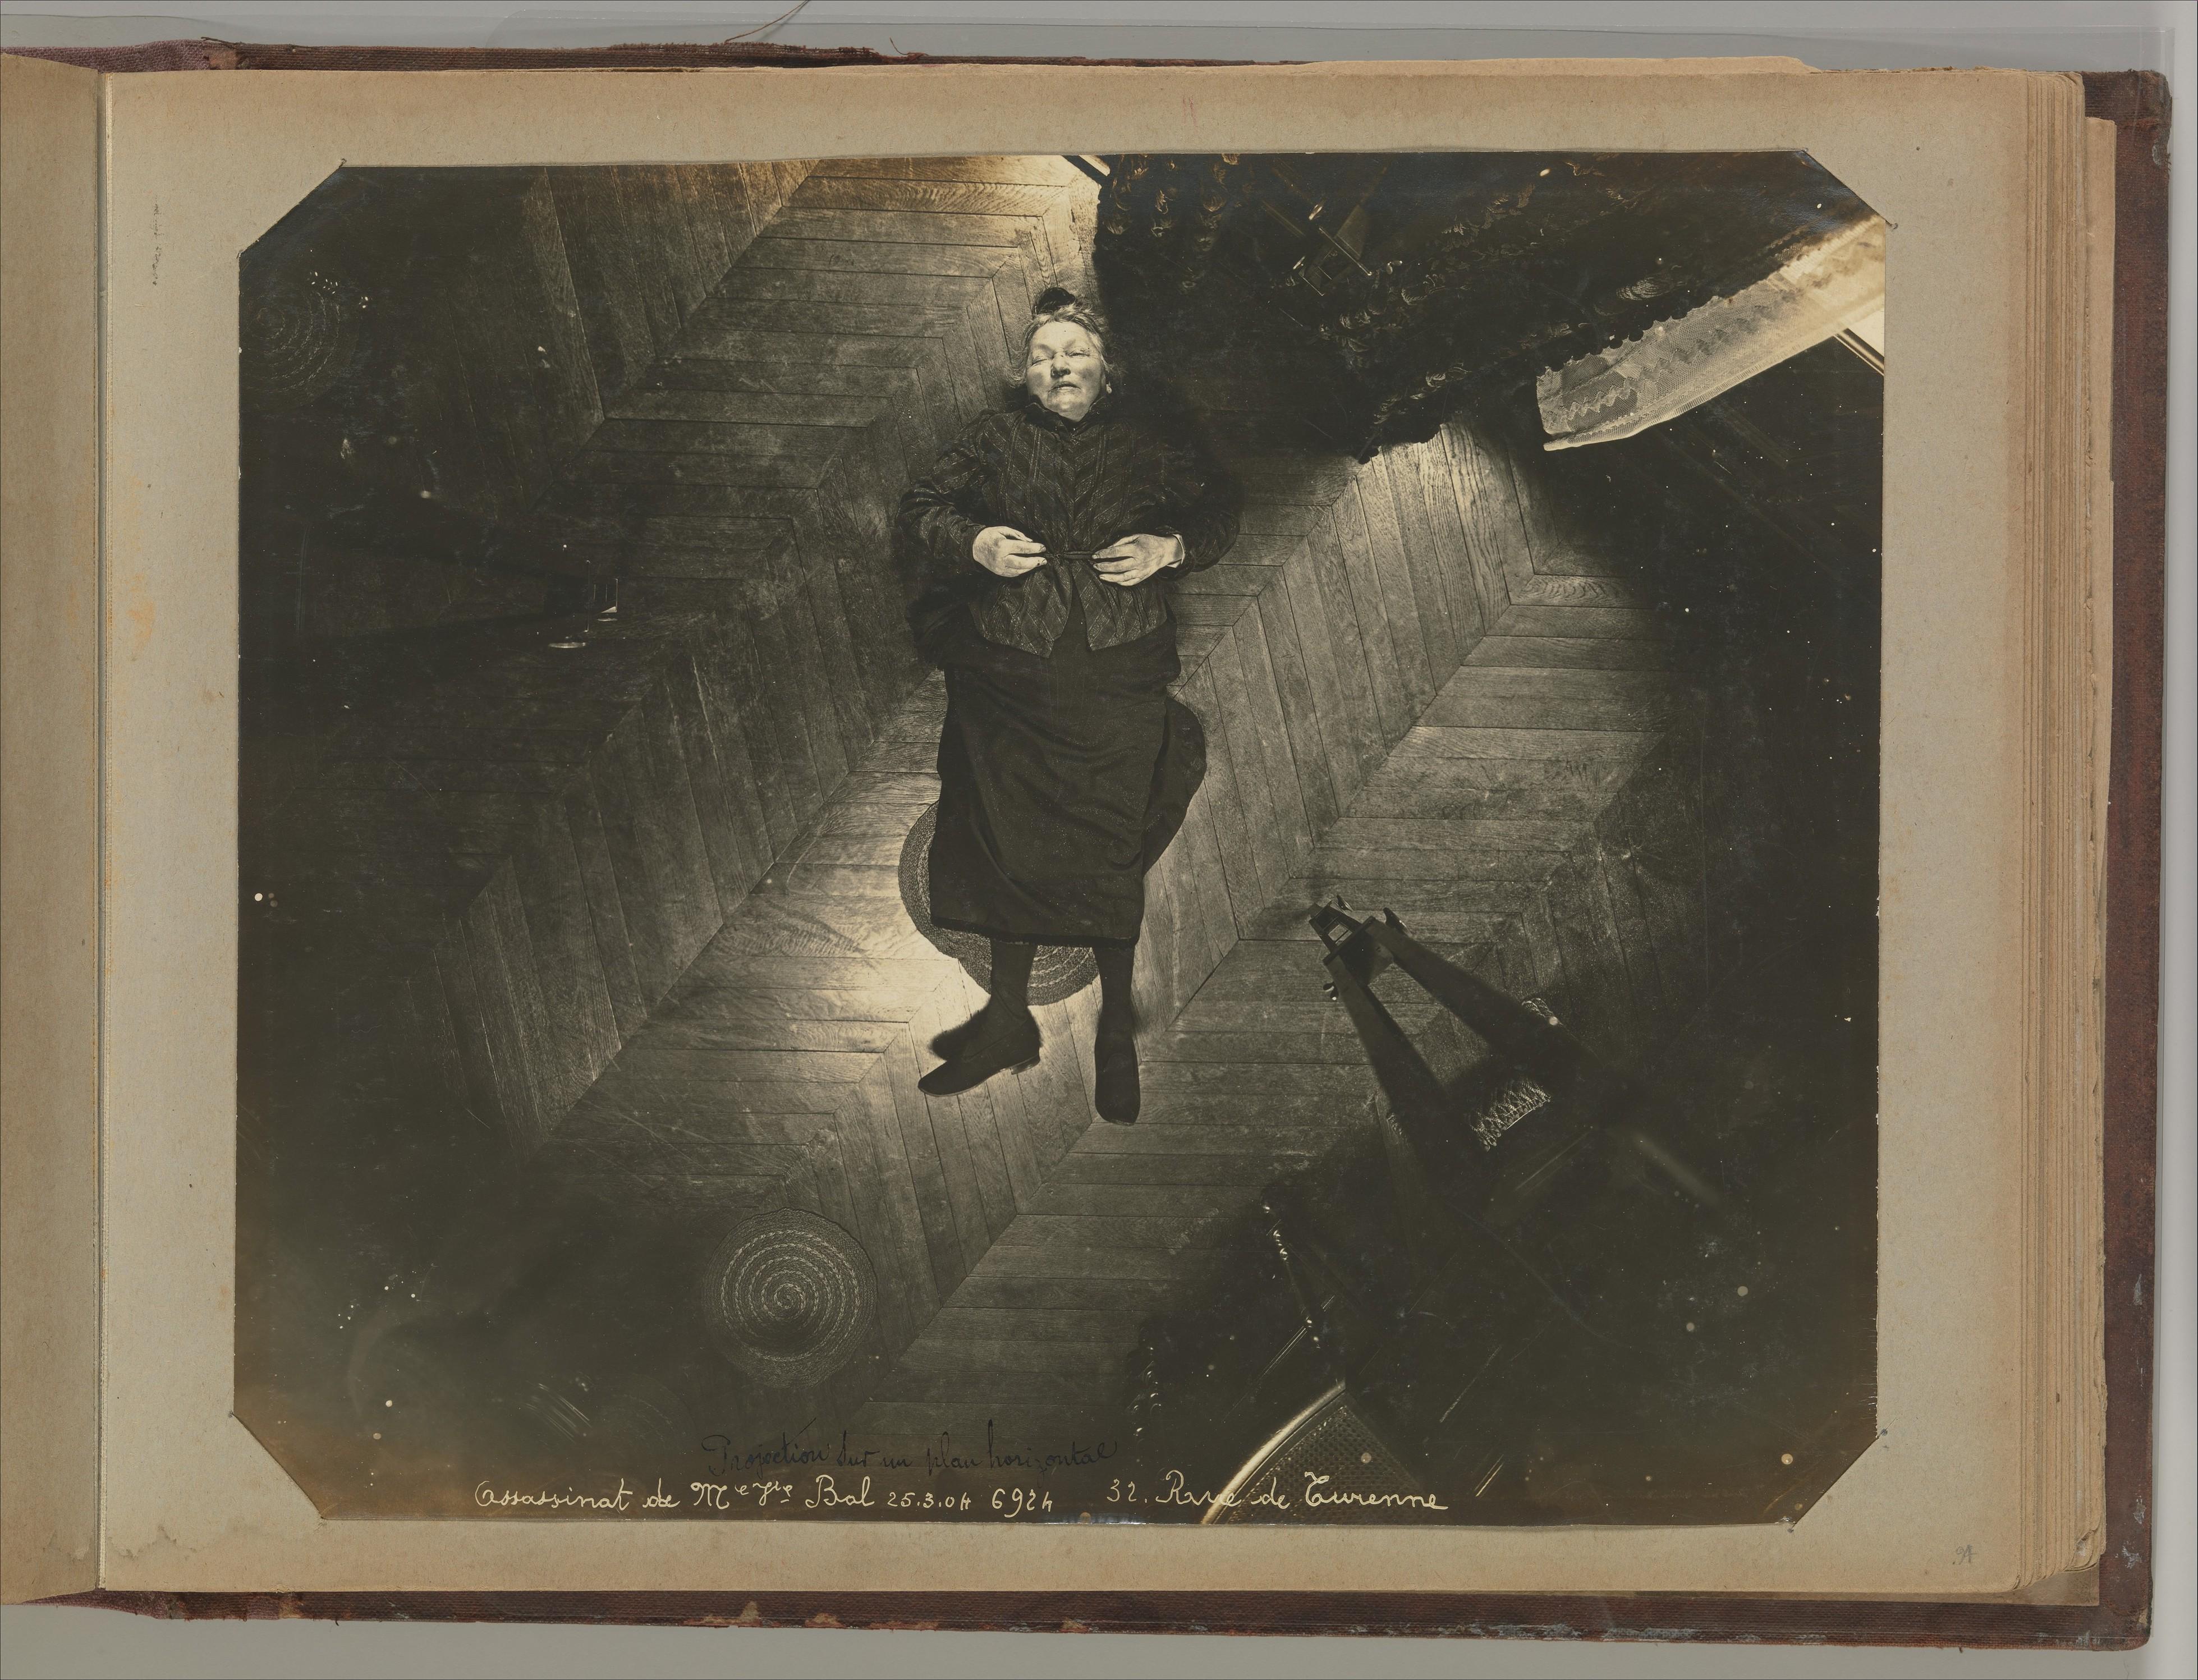 Crime Scene Training: Crime Scene Investigation 19th century crime scene photos